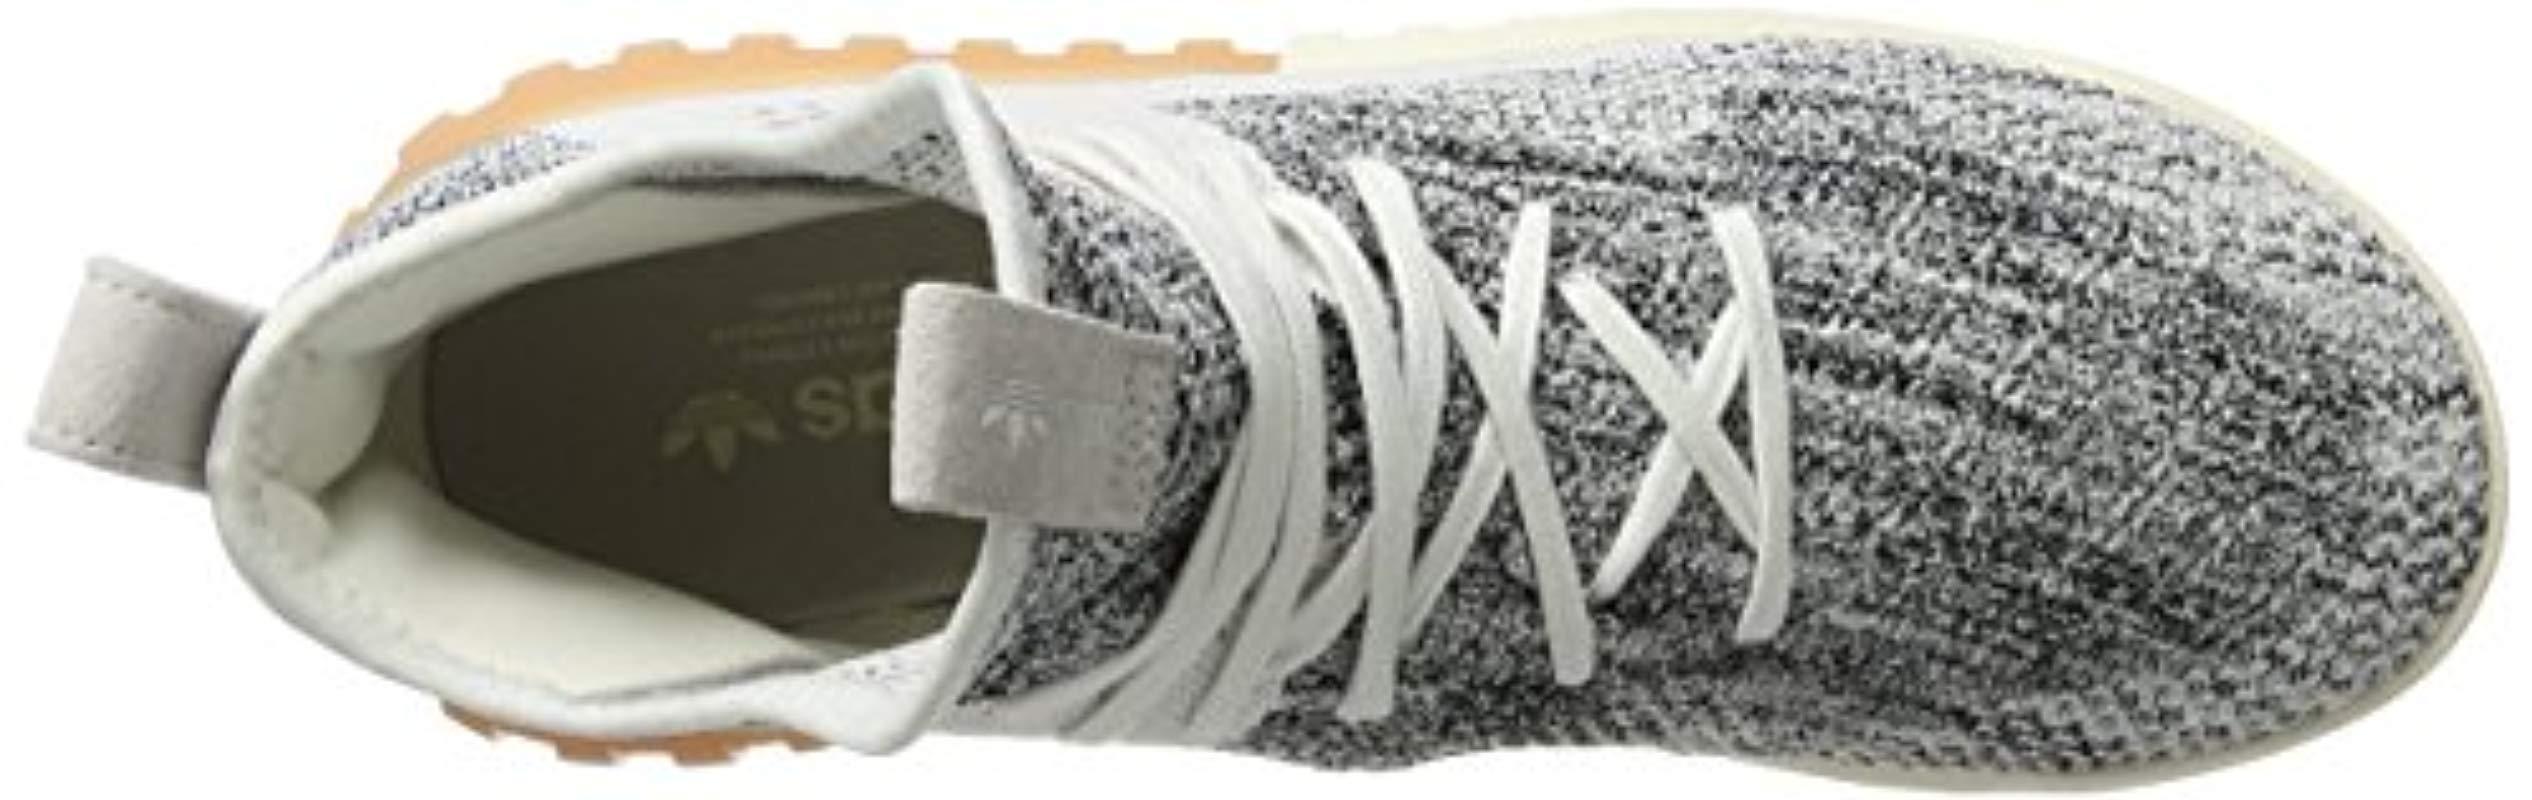 adidas Tubular X Primeknit High-top Trainers in Grey (Grey) for Men